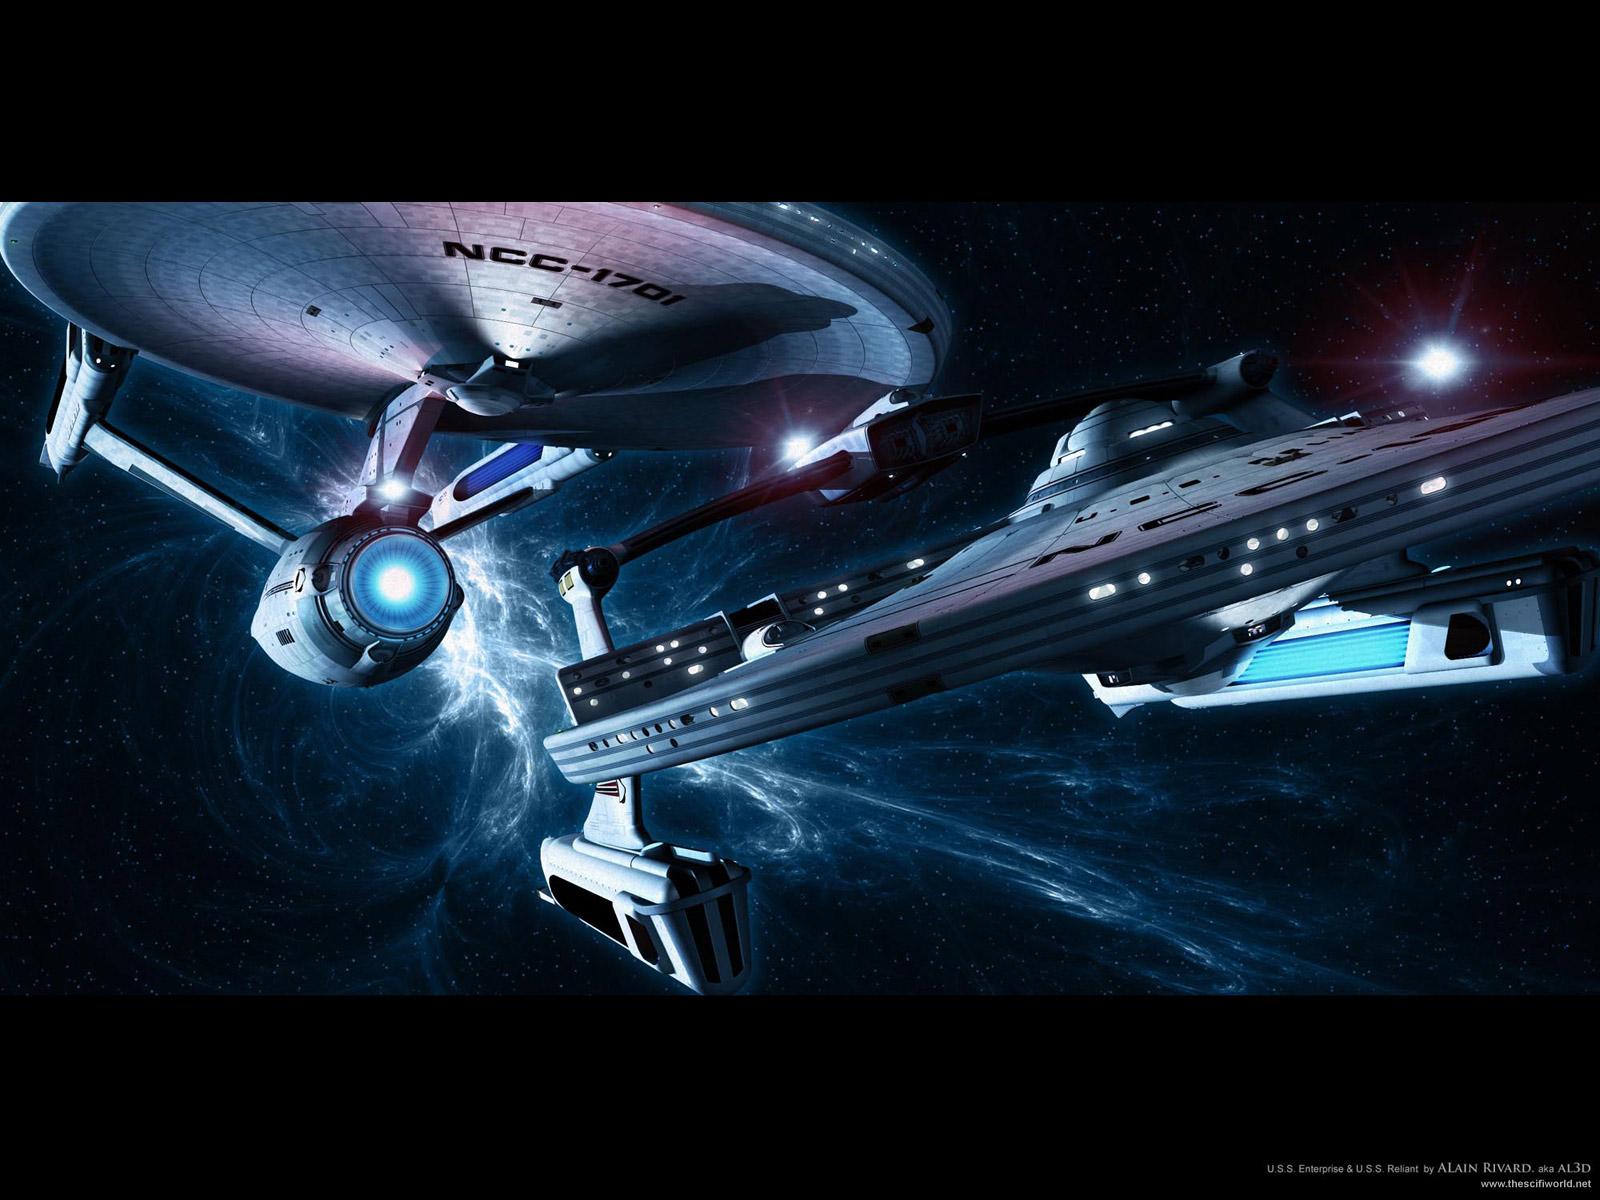 star trek starships uss enterprise and uss reliant on sector patrol 1600x1200